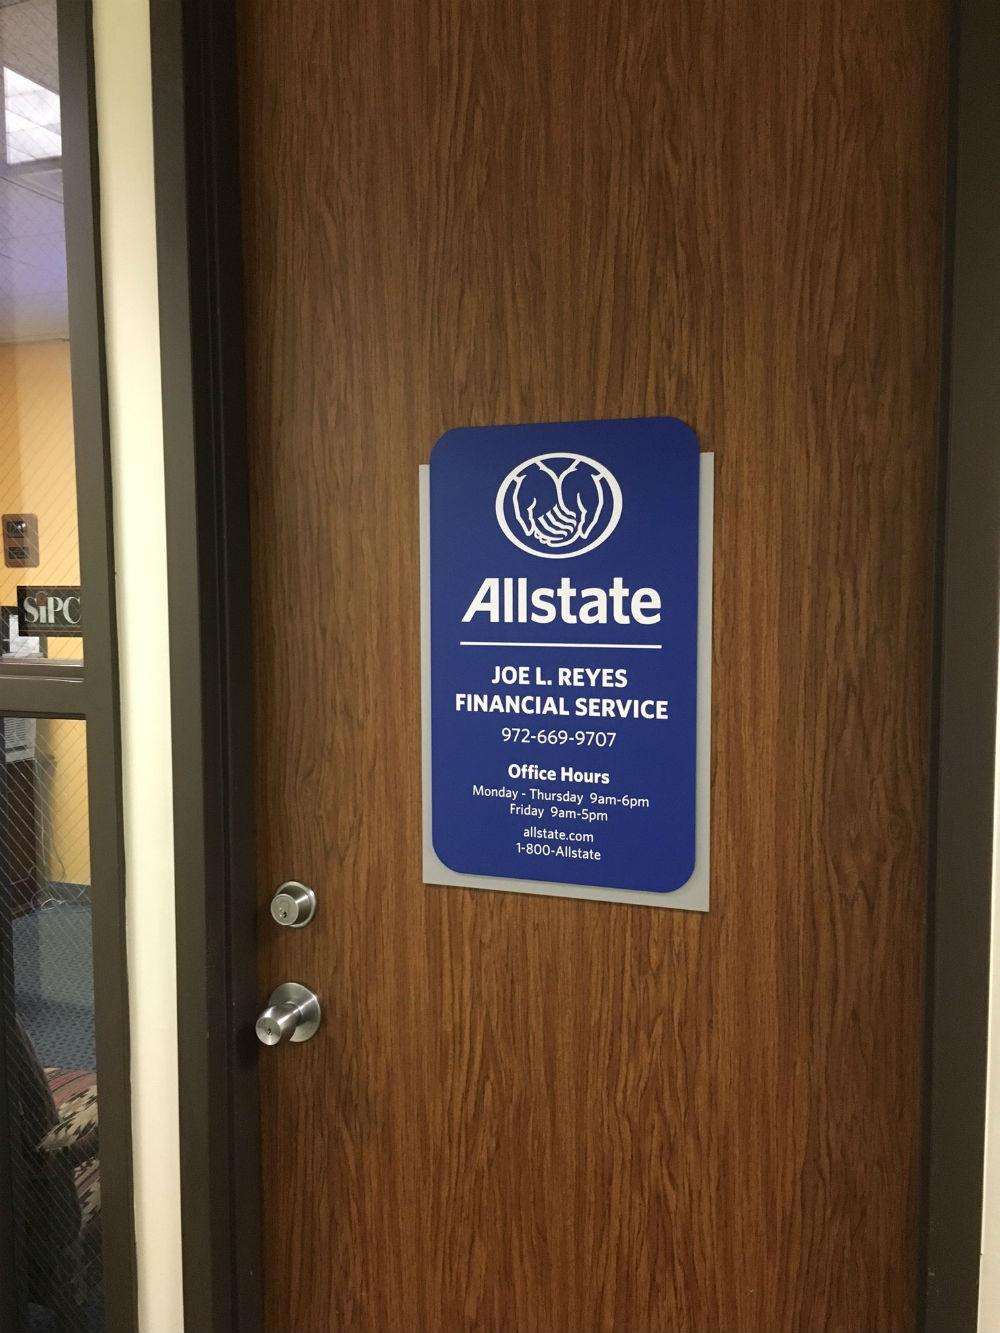 Joe L. Reyes: Allstate Insurance image 2